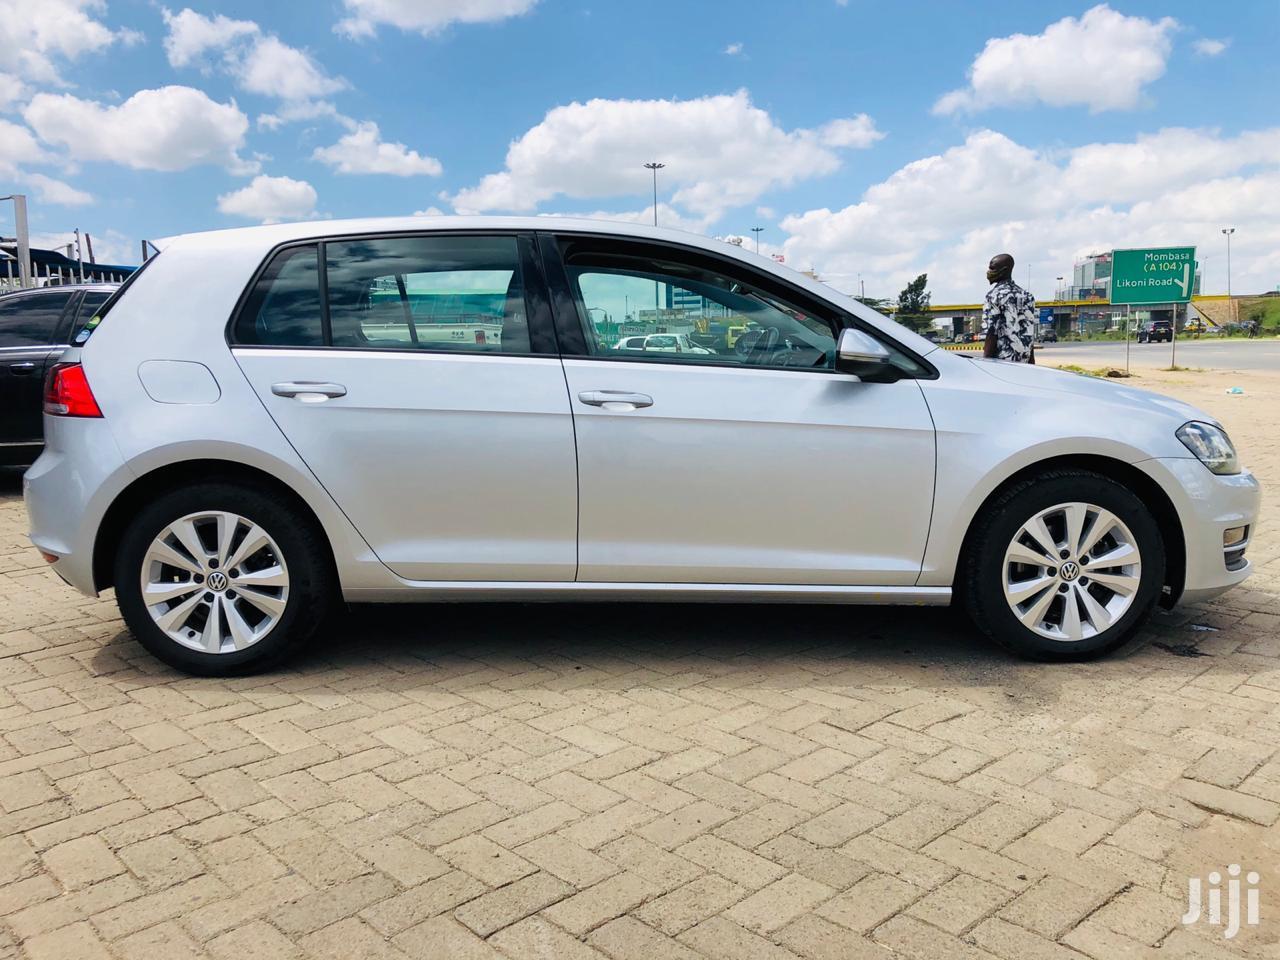 Volkswagen Golf 2013 Silver   Cars for sale in Nairobi South, Nairobi, Kenya